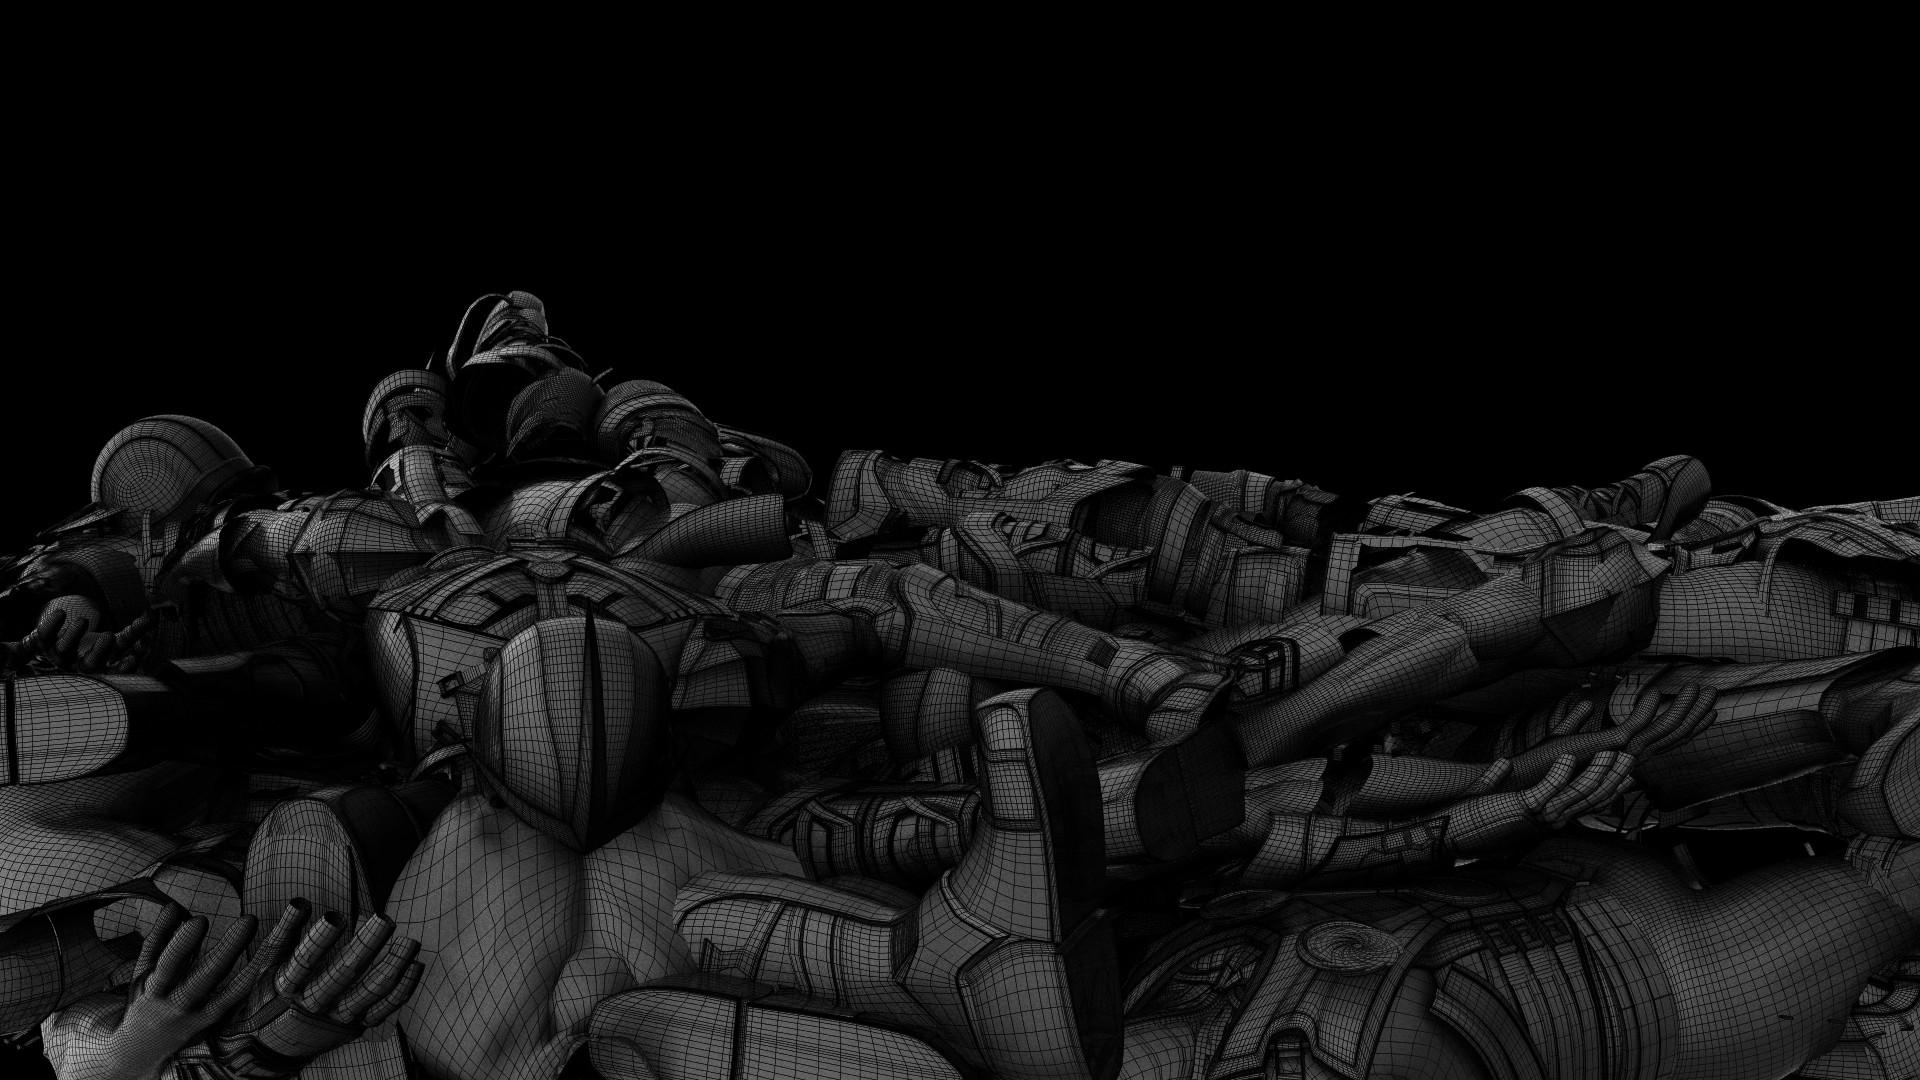 Dead bodies wireframe